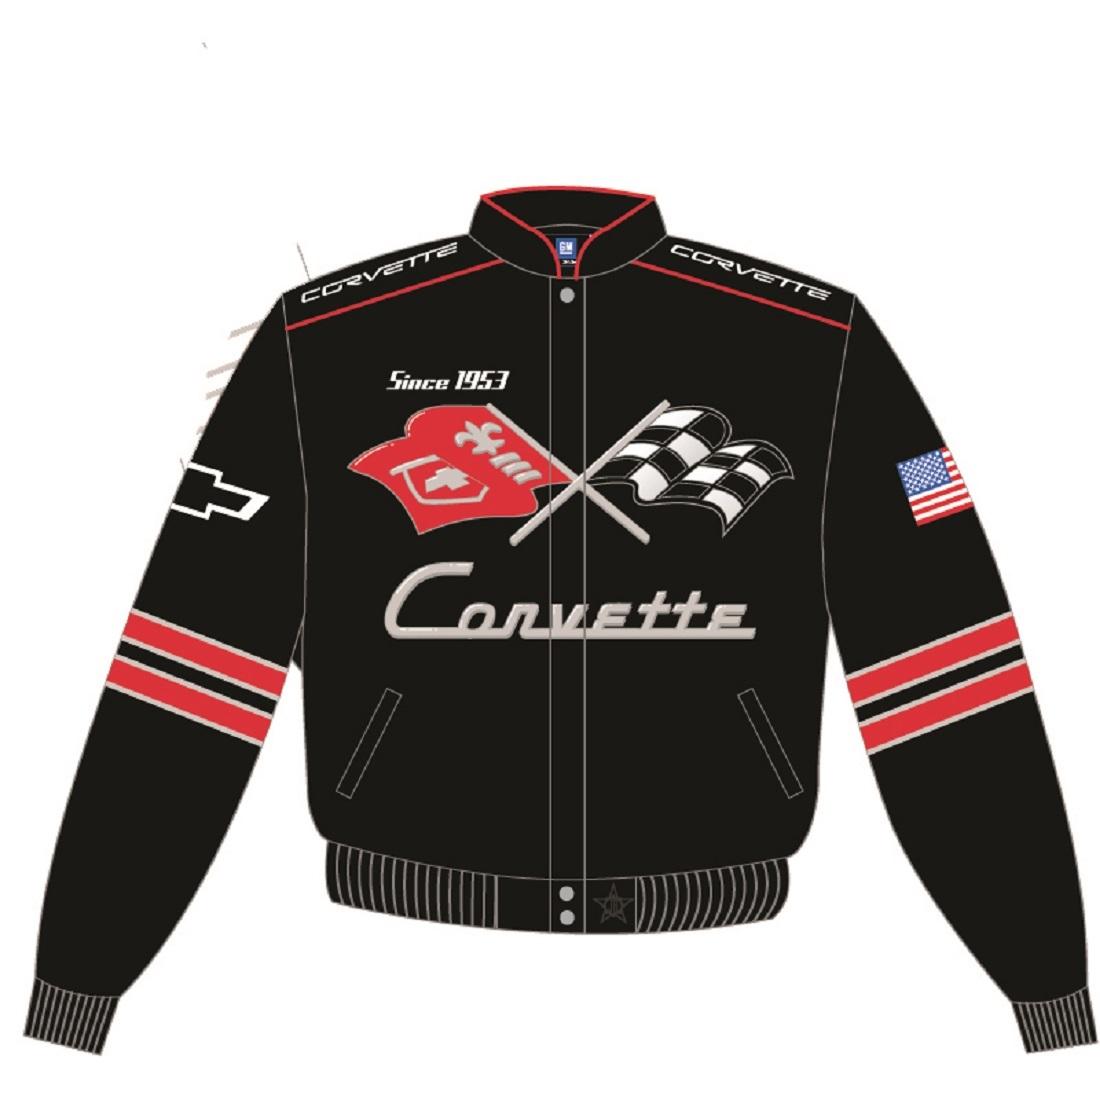 4657658350740 J.H Cotton Twill Embroidered Jacket COR303GEN4BLK Design Chevy Corvette  Jacket for Men